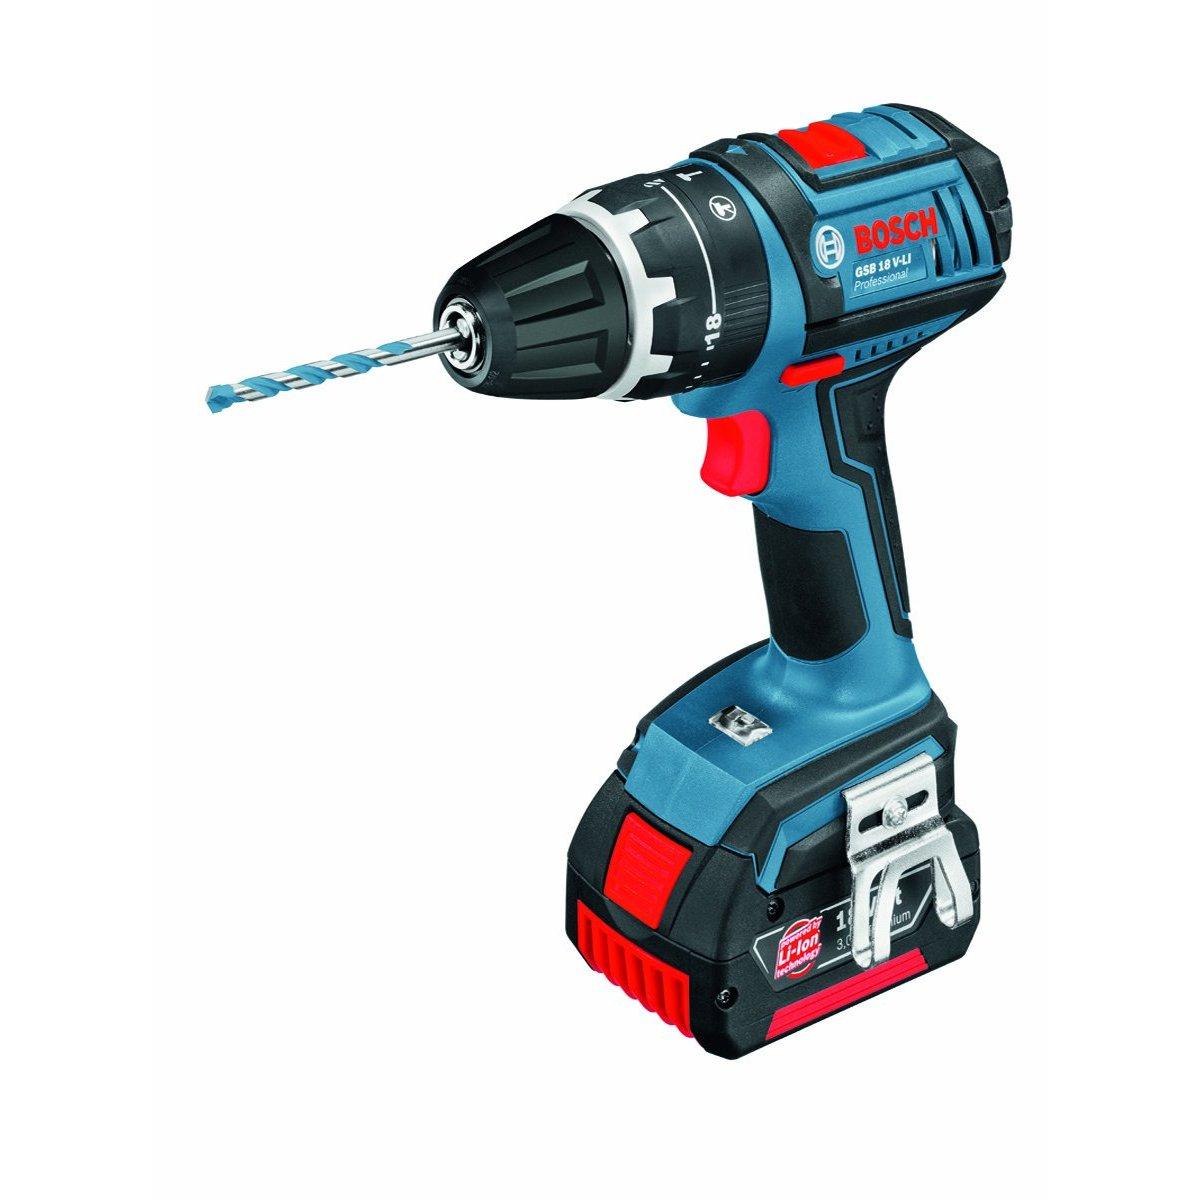 genuine tool reviews from a working tradesman bosch gsb v li professional combi drill 18 volt. Black Bedroom Furniture Sets. Home Design Ideas